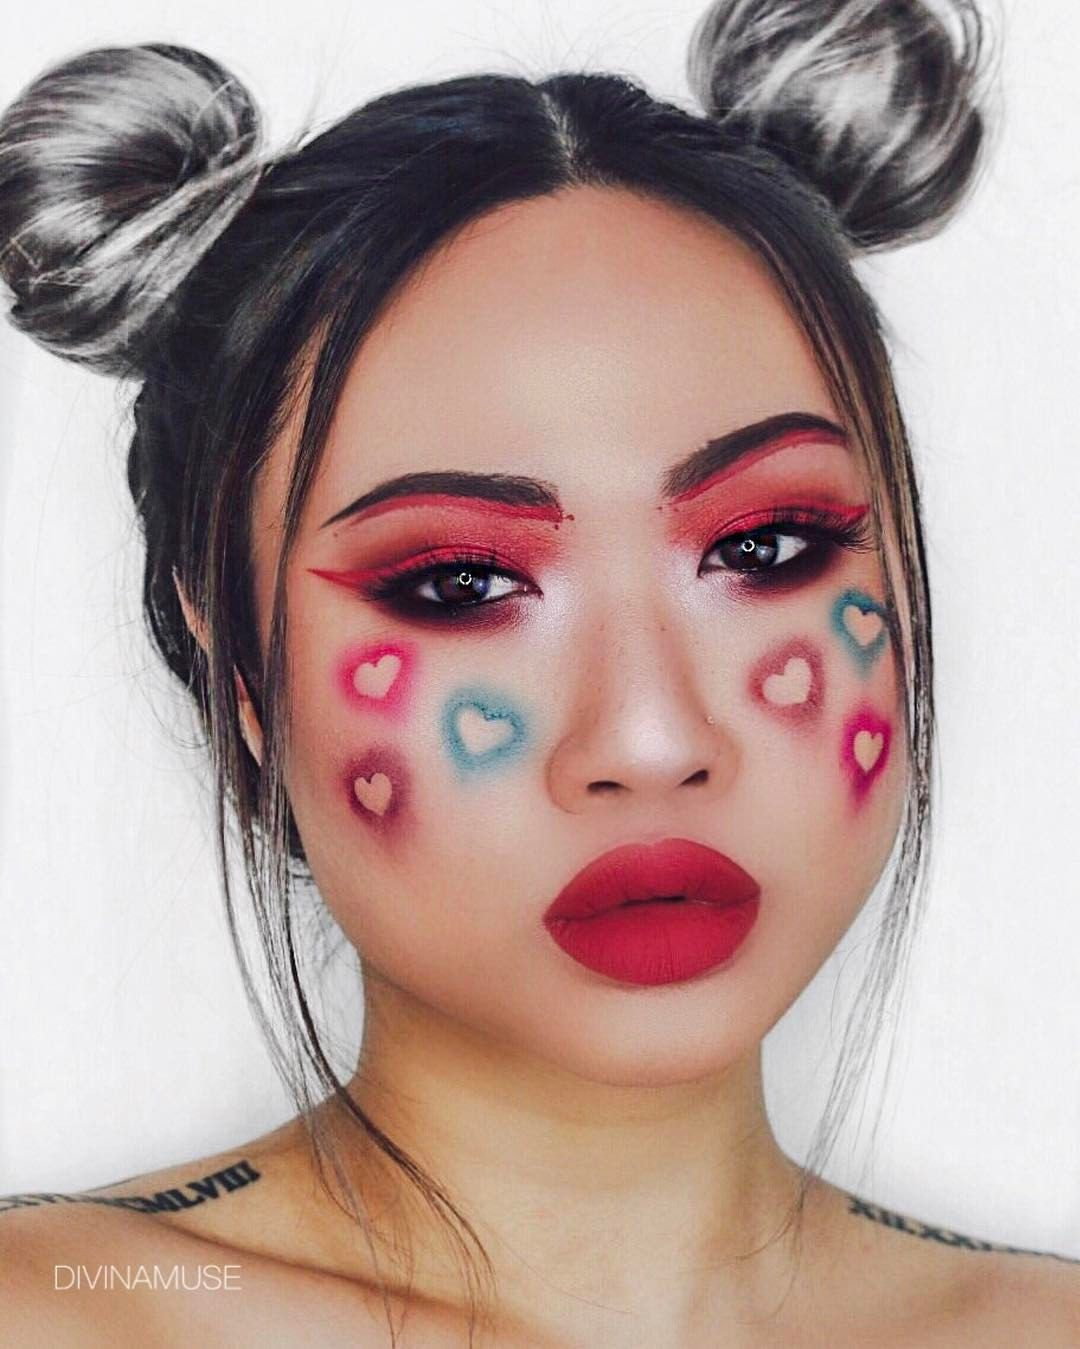 Amour Instagram Divinamuse Crazy Makeup Valentines Makeup